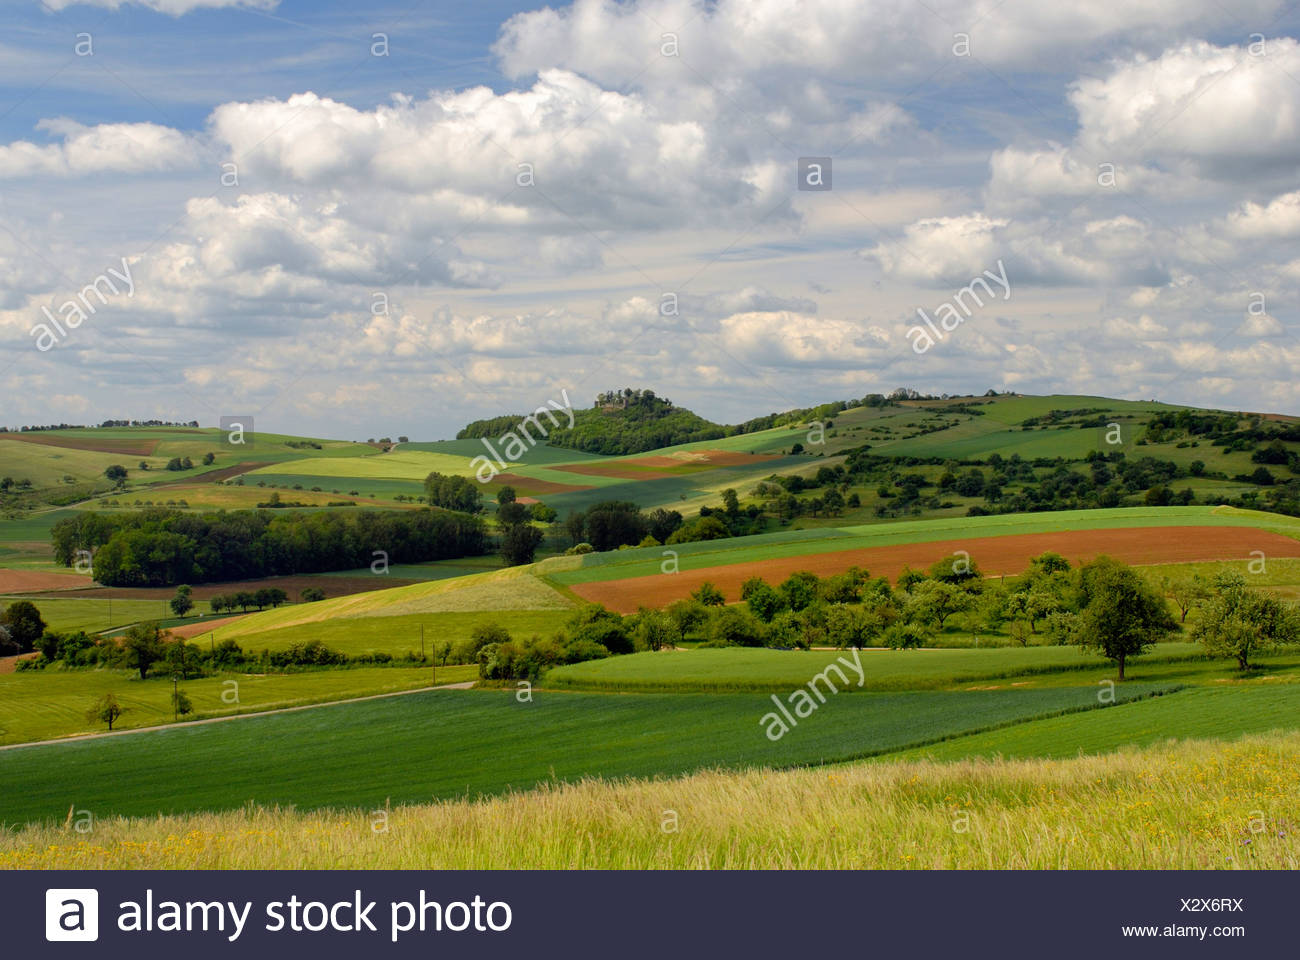 Hegau-Landscape - South Germany, Baden Wuerttemberg, Germany, Europe. Stock Photo